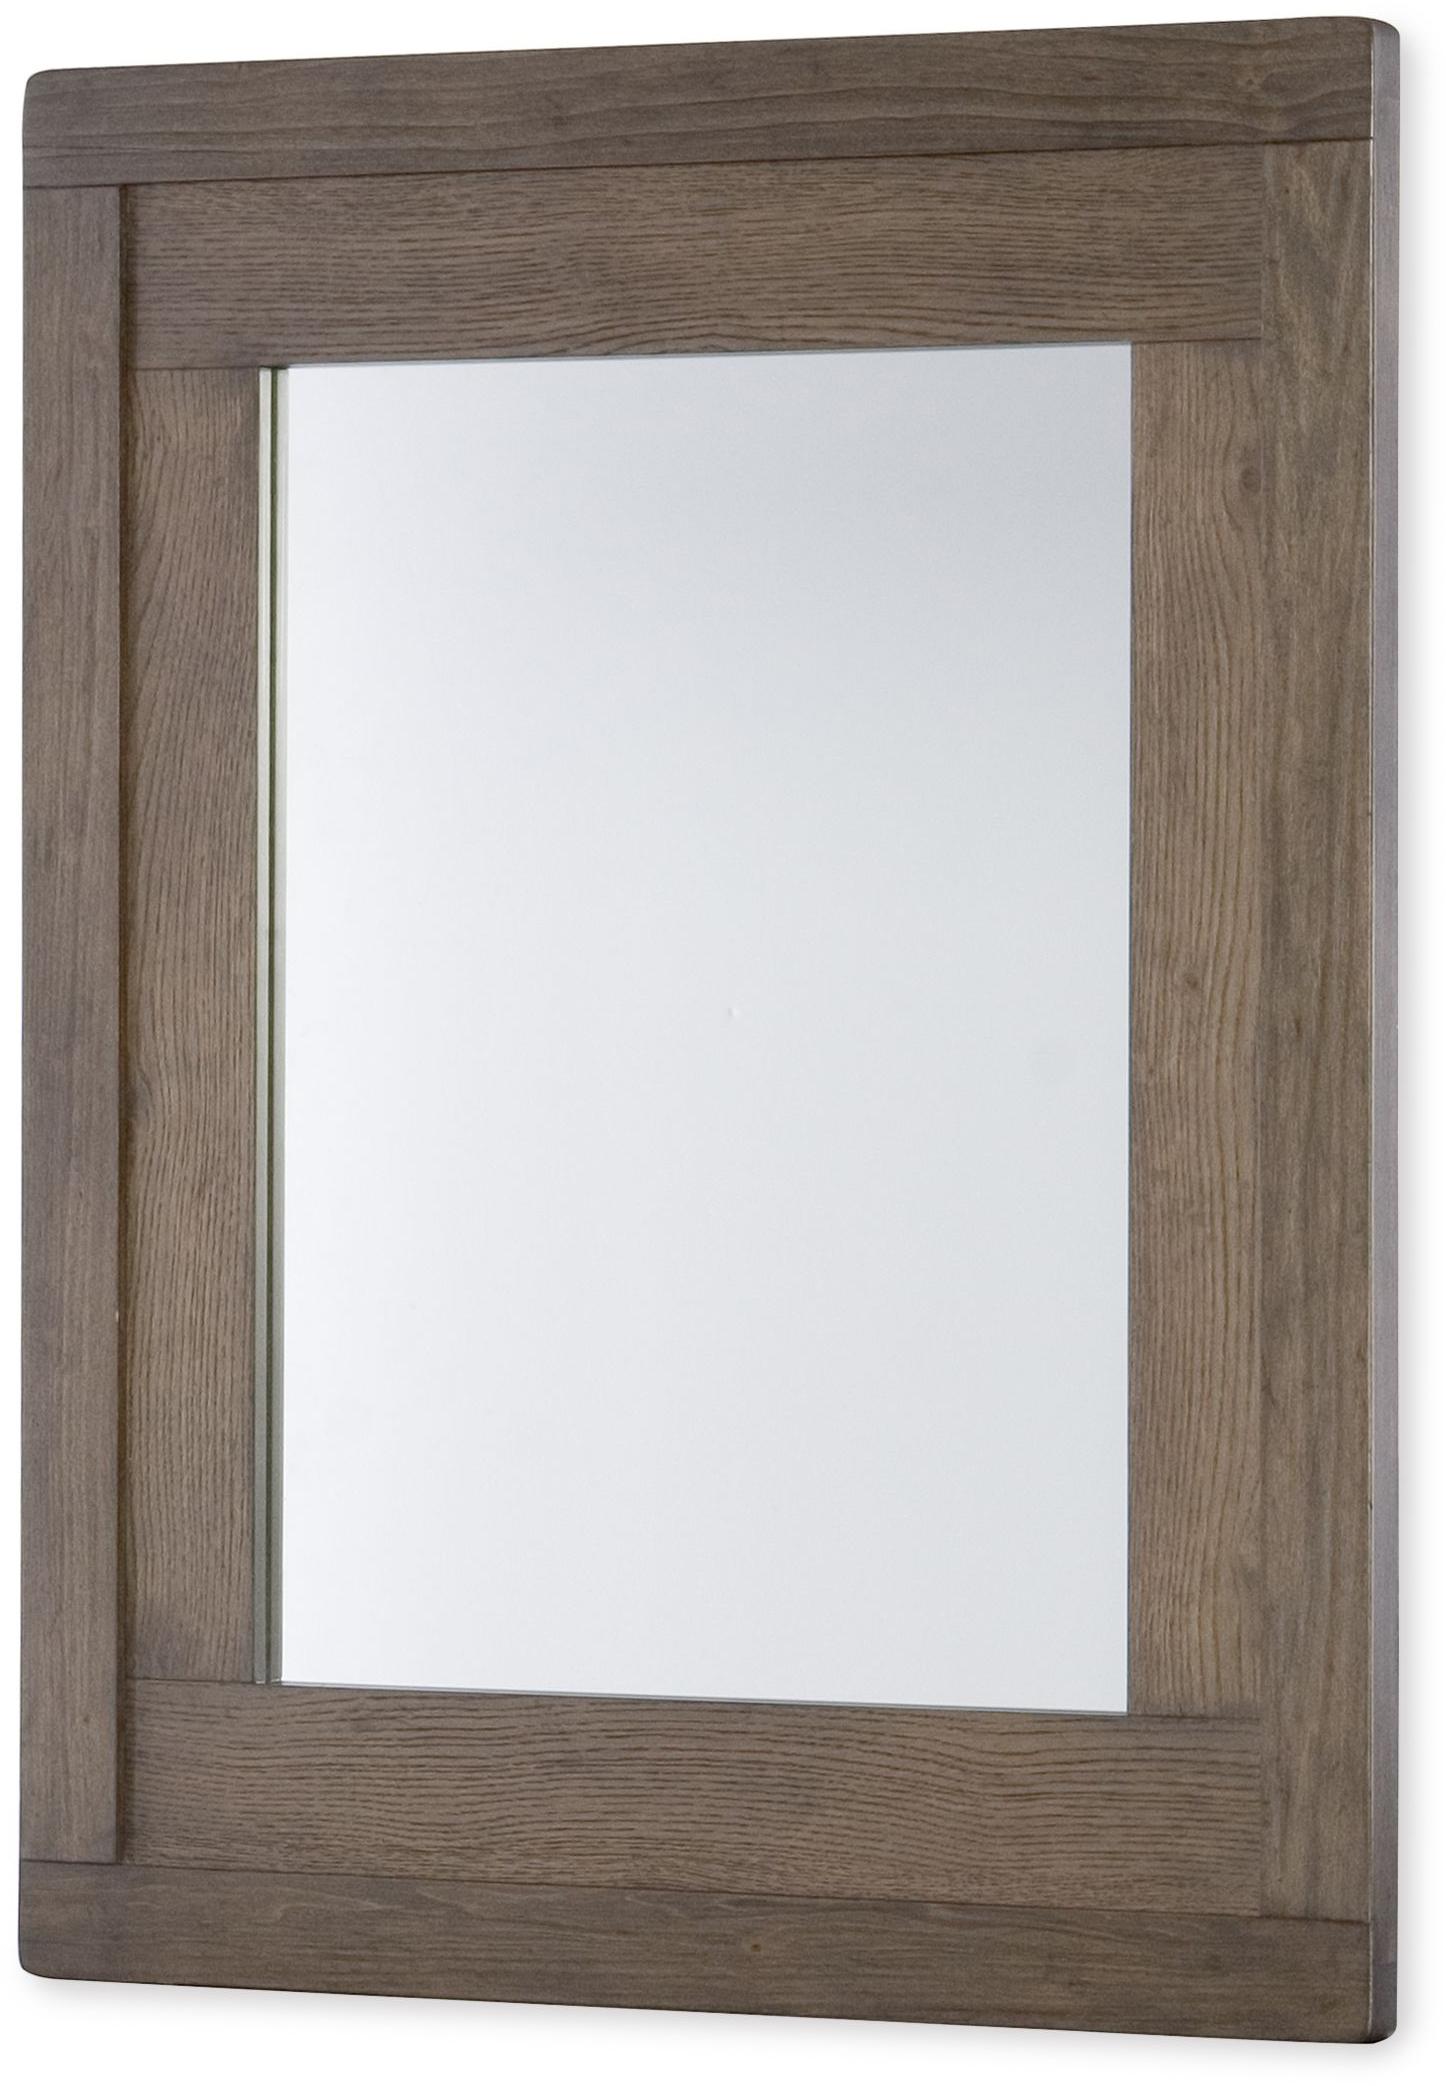 Turpin Mirror